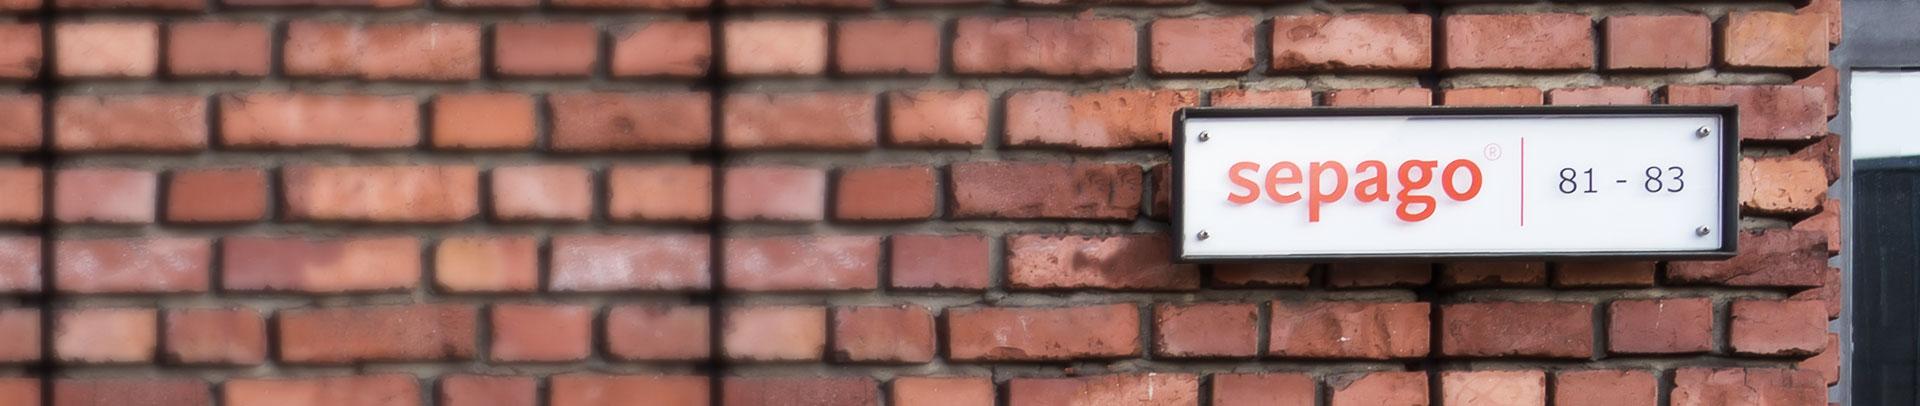 sepago Backsteinmauer